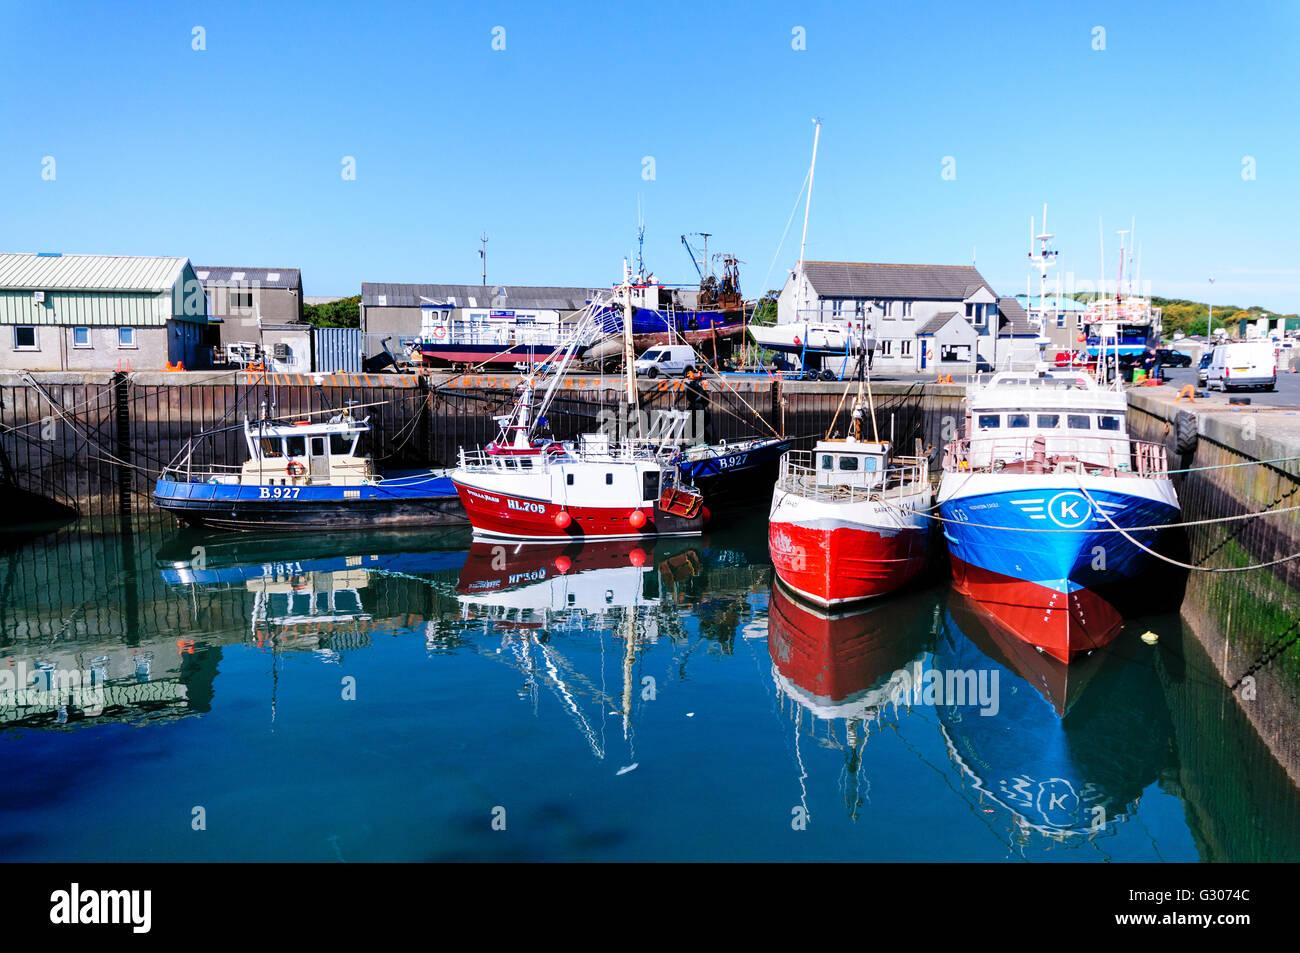 Trawlers berthed at Kilkeel Harbour, Northern Ireland - Stock Image